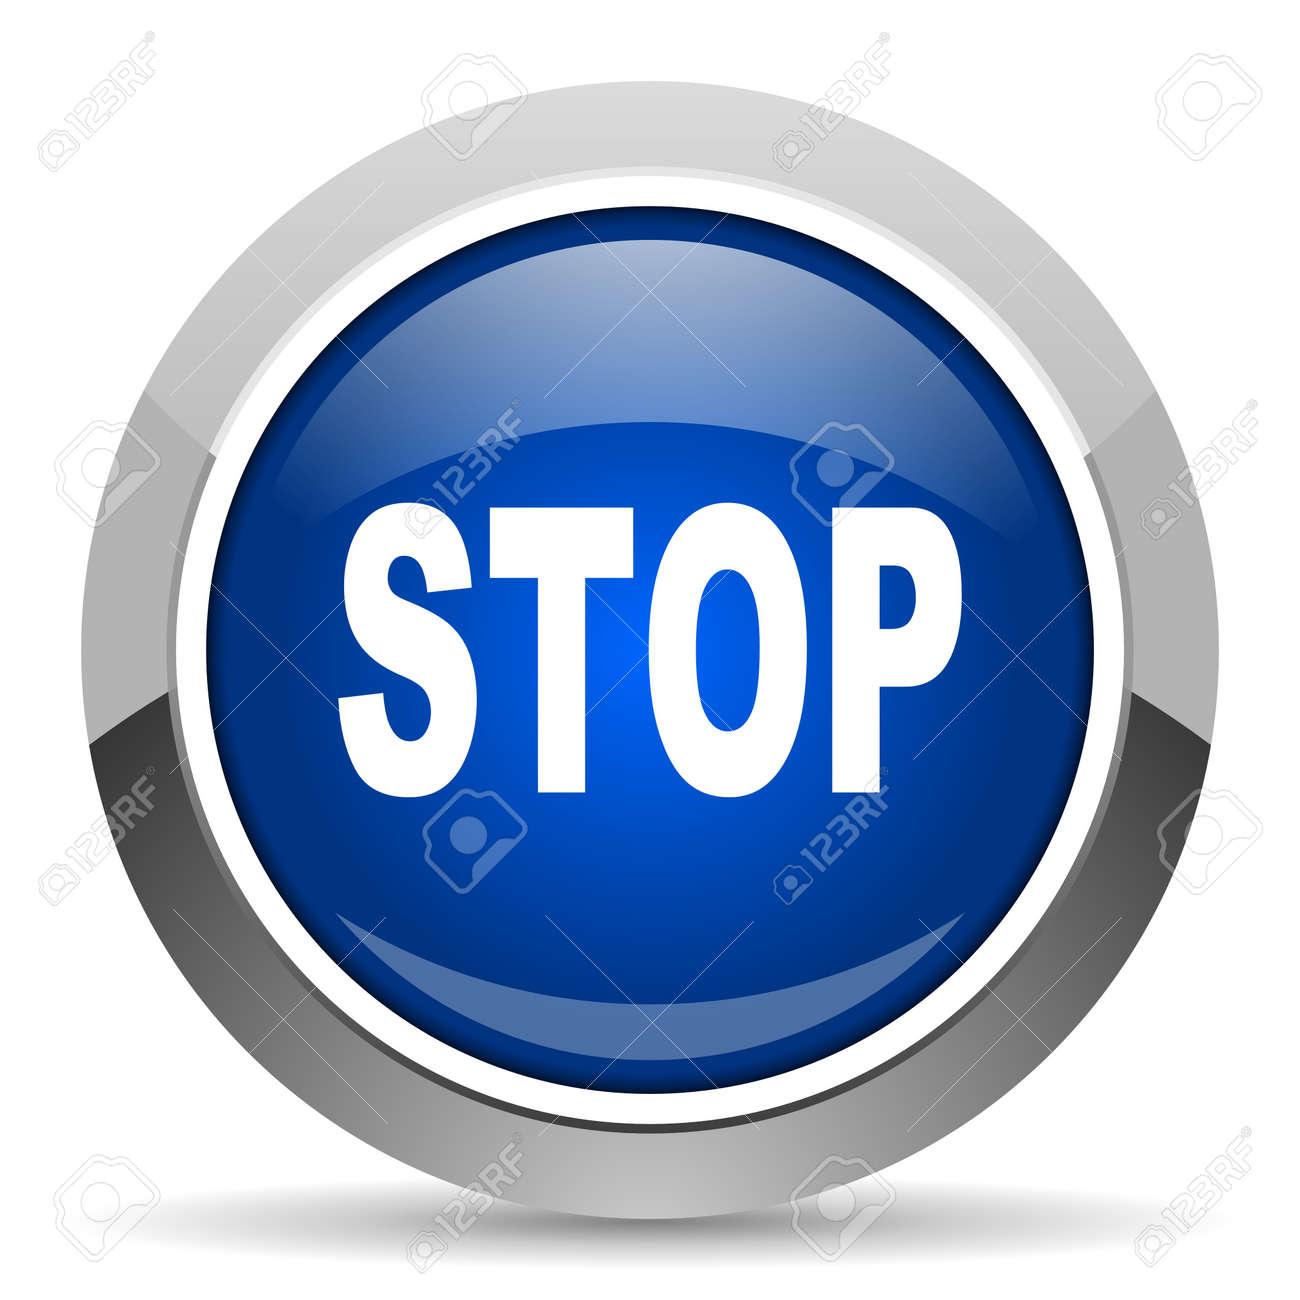 stop icon Stock Photo - 20468850